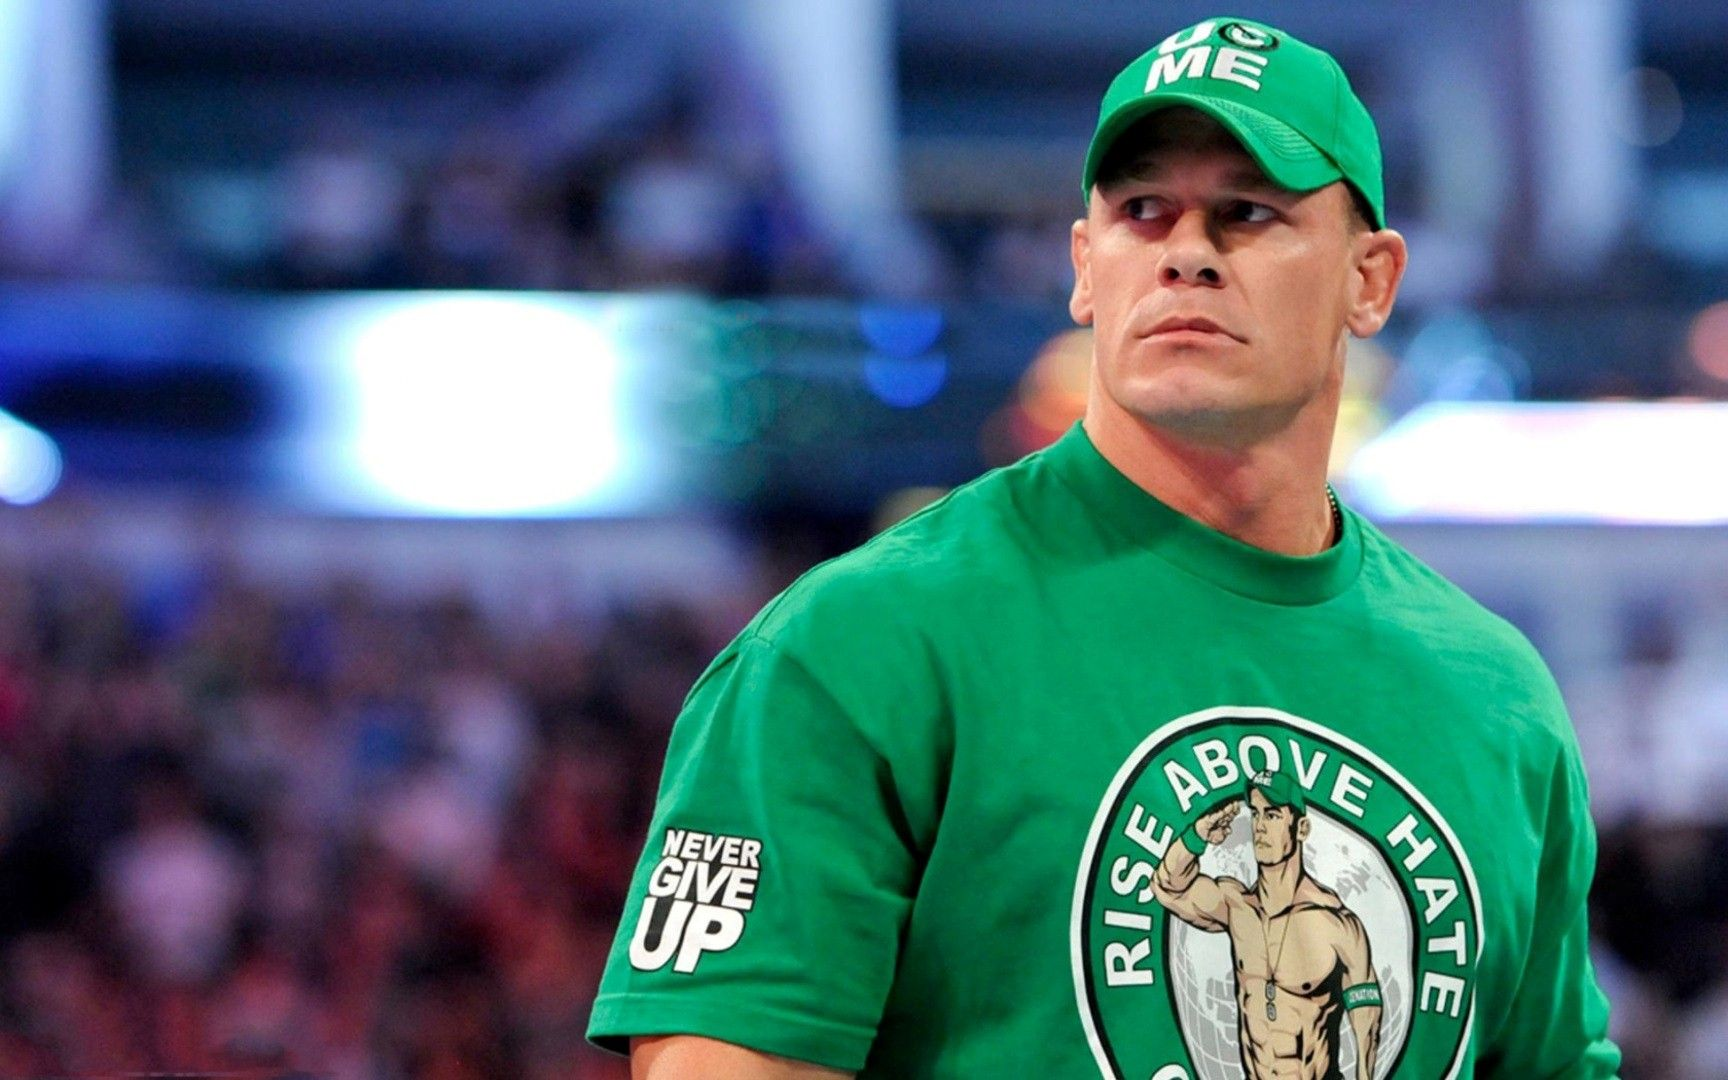 John Cena Wallpapers Hd Free Download Latest John Cena Wallpapers